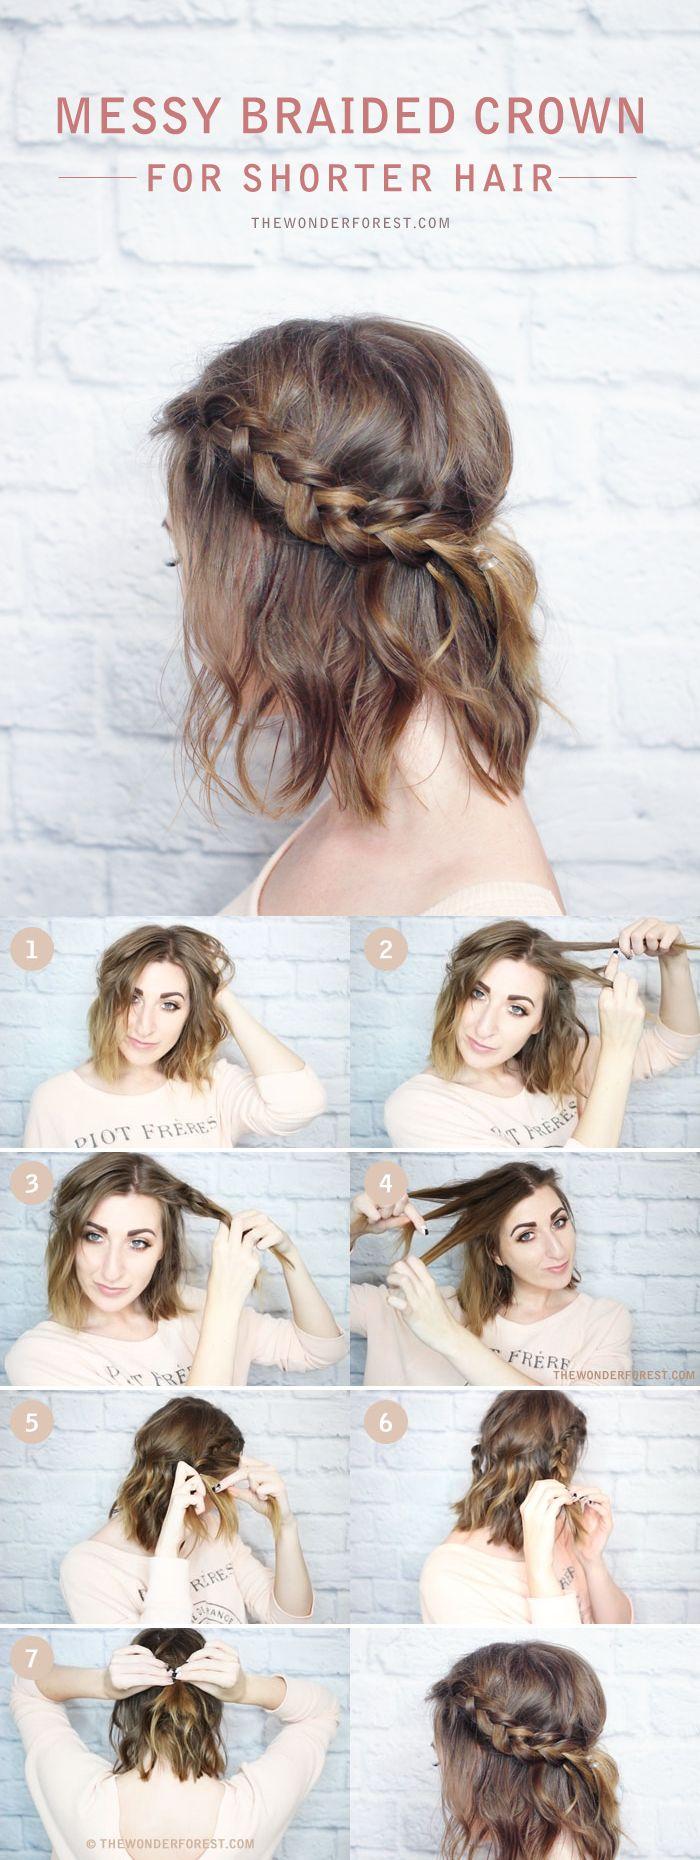 25 Best Ideas About Shorter Hair On Pinterest Hairstyles Short